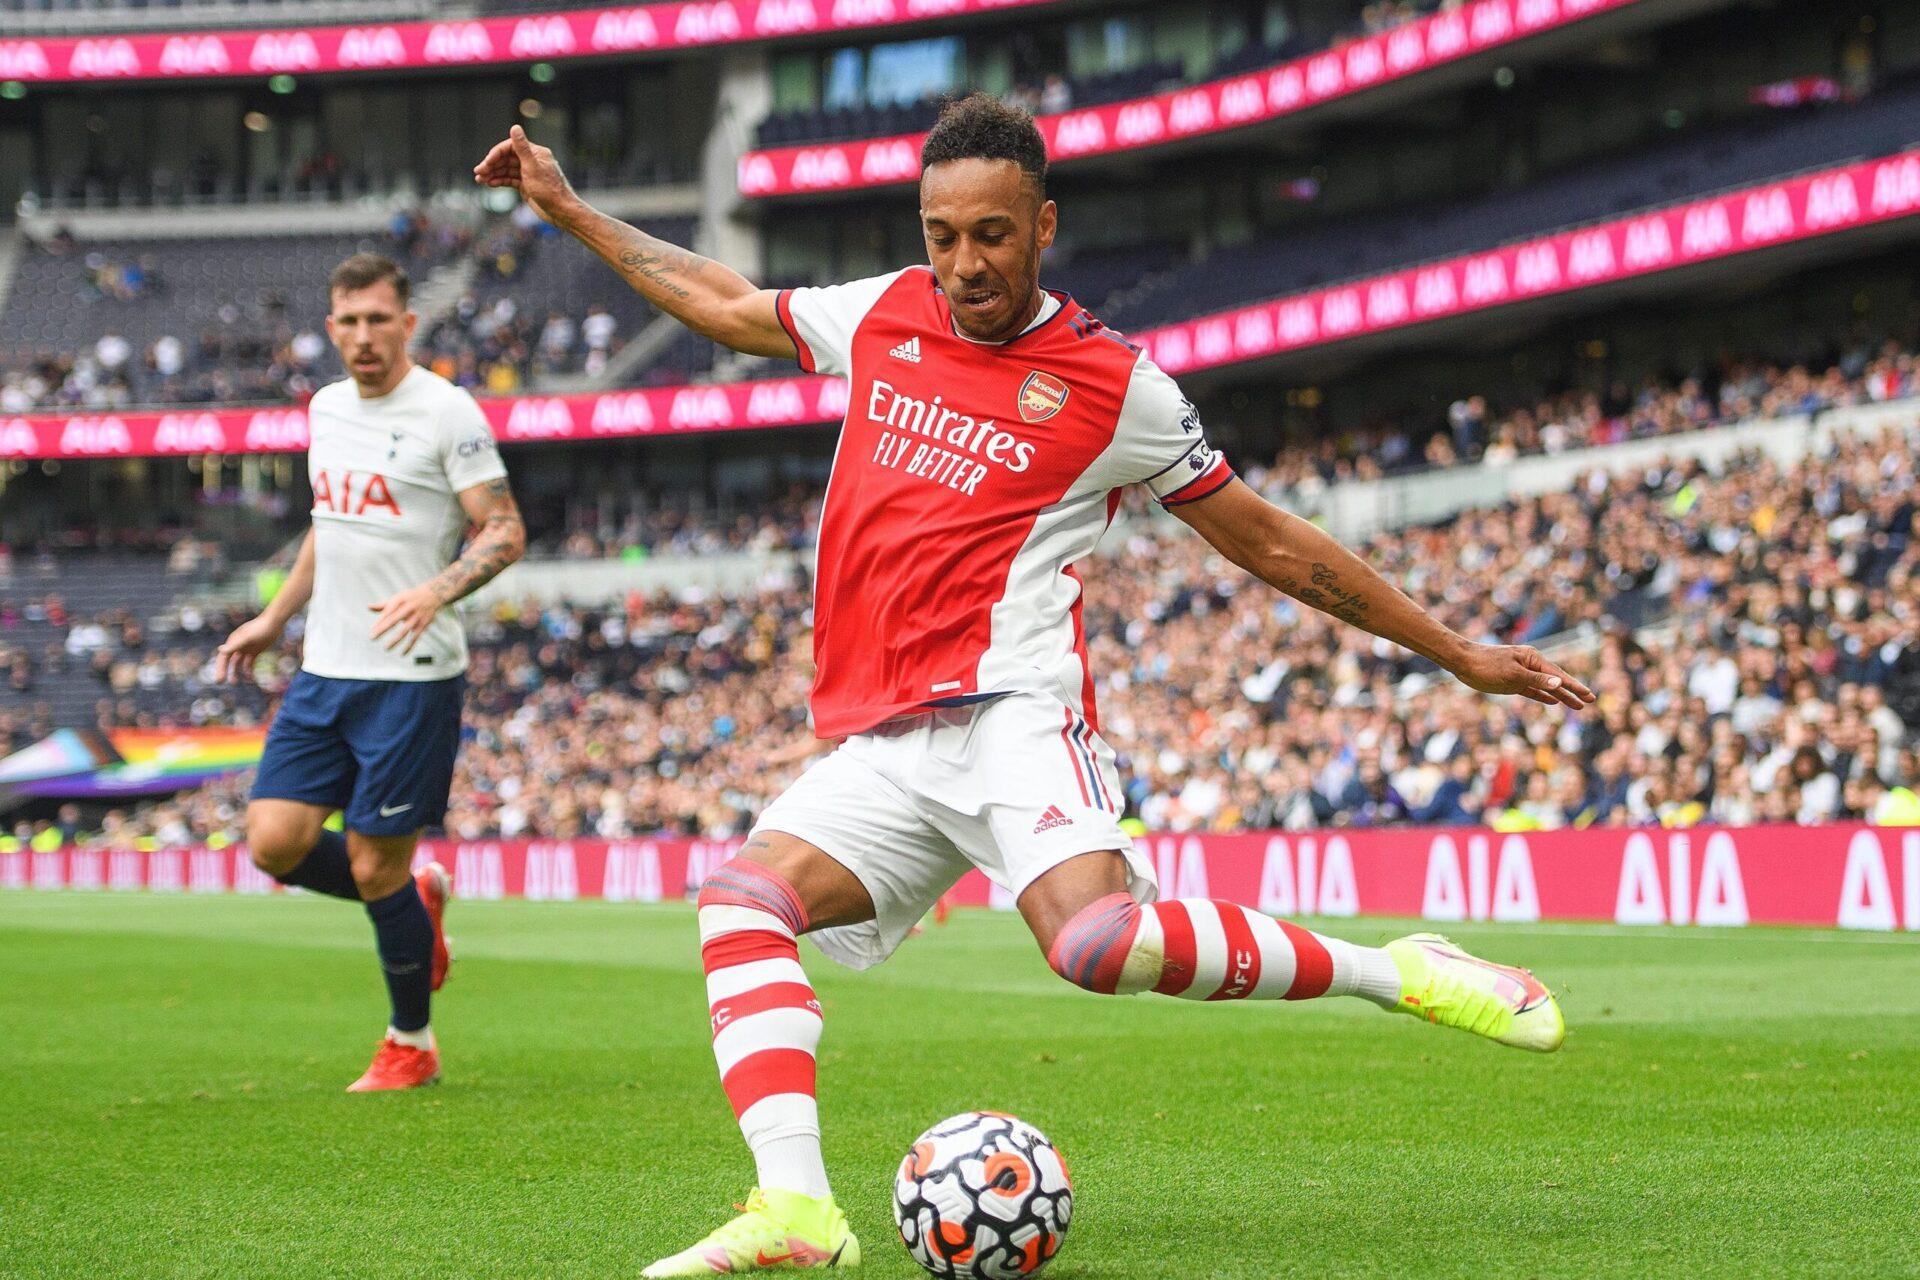 Pierre-Emerick Aubameyang portant le maillot d'Arsenal (Icon Sport)